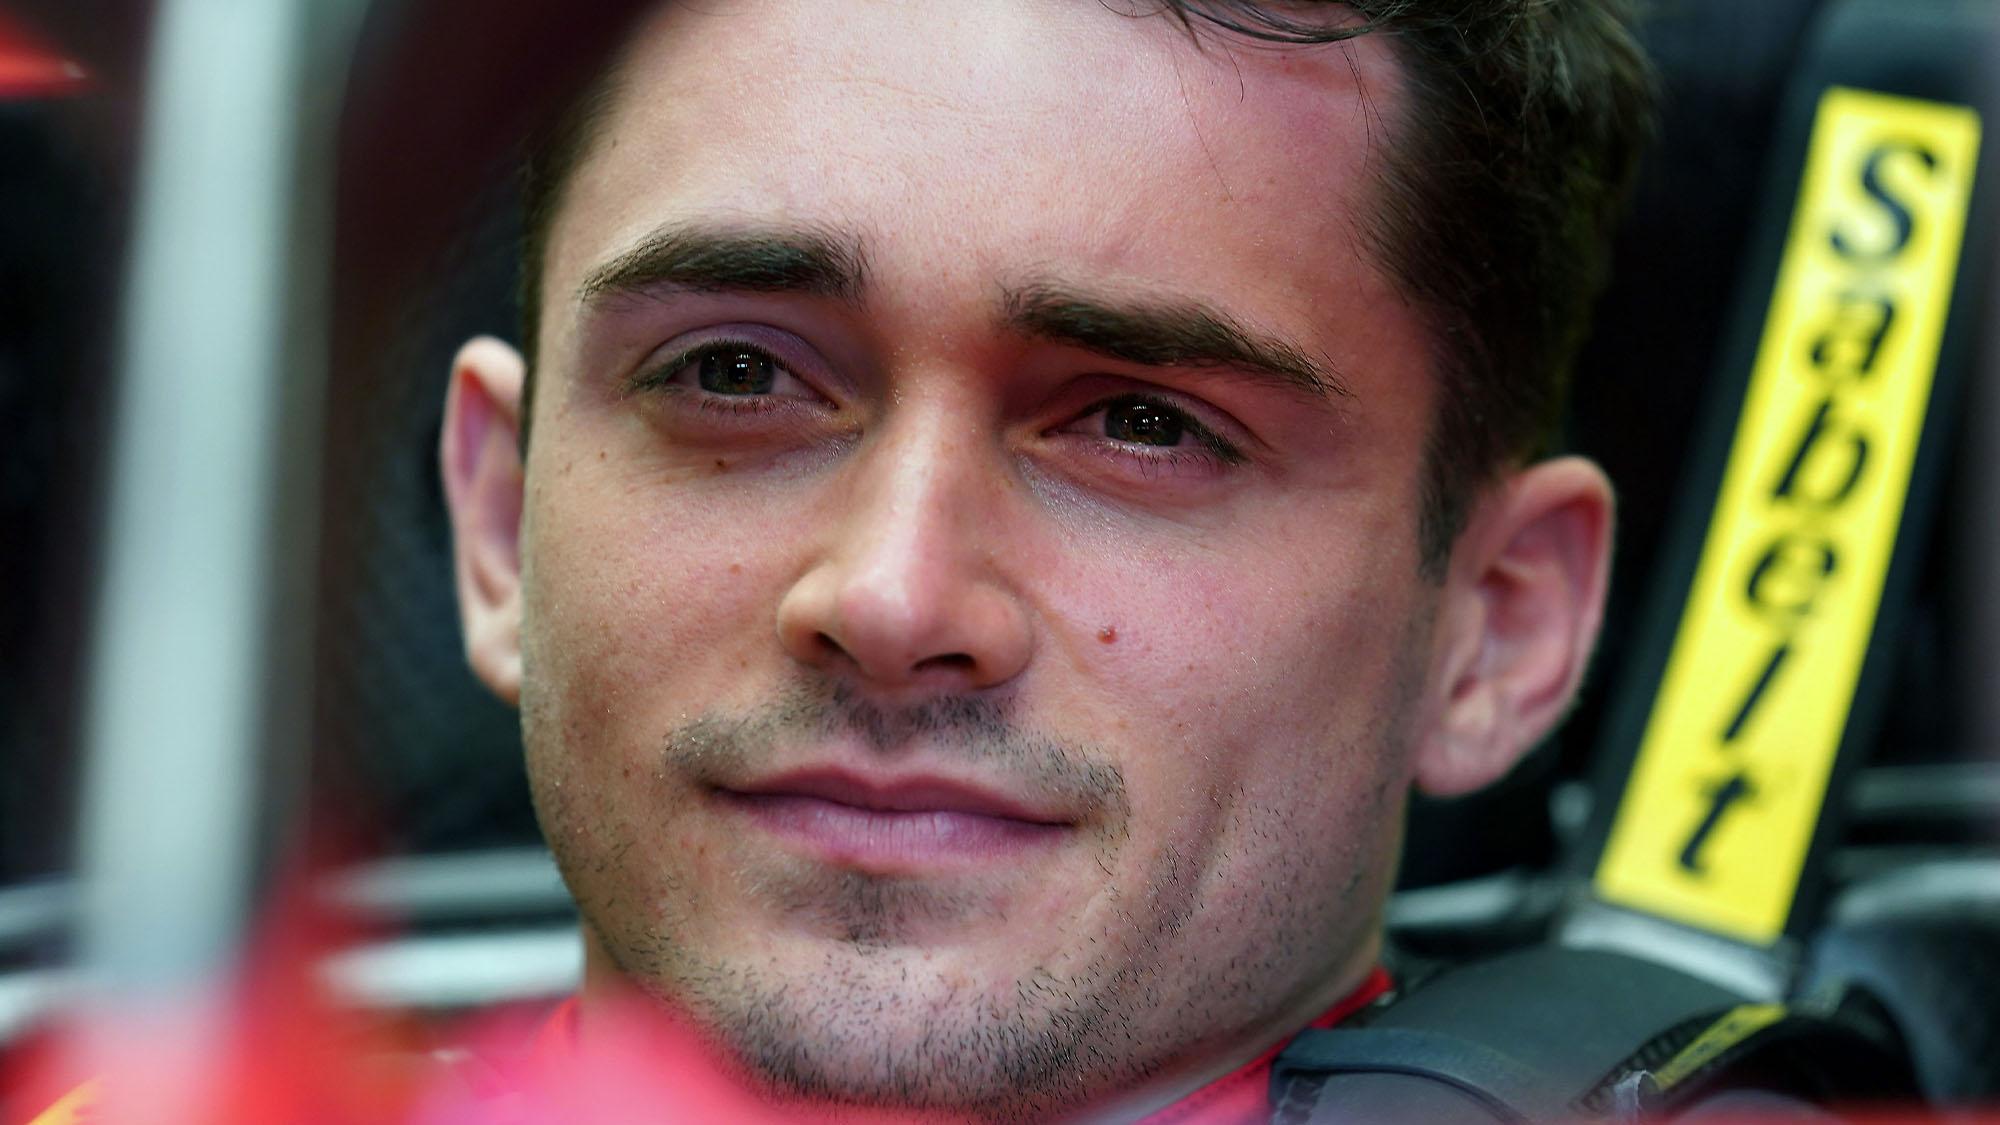 Charles Leclerc (Ferrari) before the 2021 Bahrain Grand Prix. Photo: © Copyright: FIA Pool Image via Grand Prix Photo - for Editorial Use Only